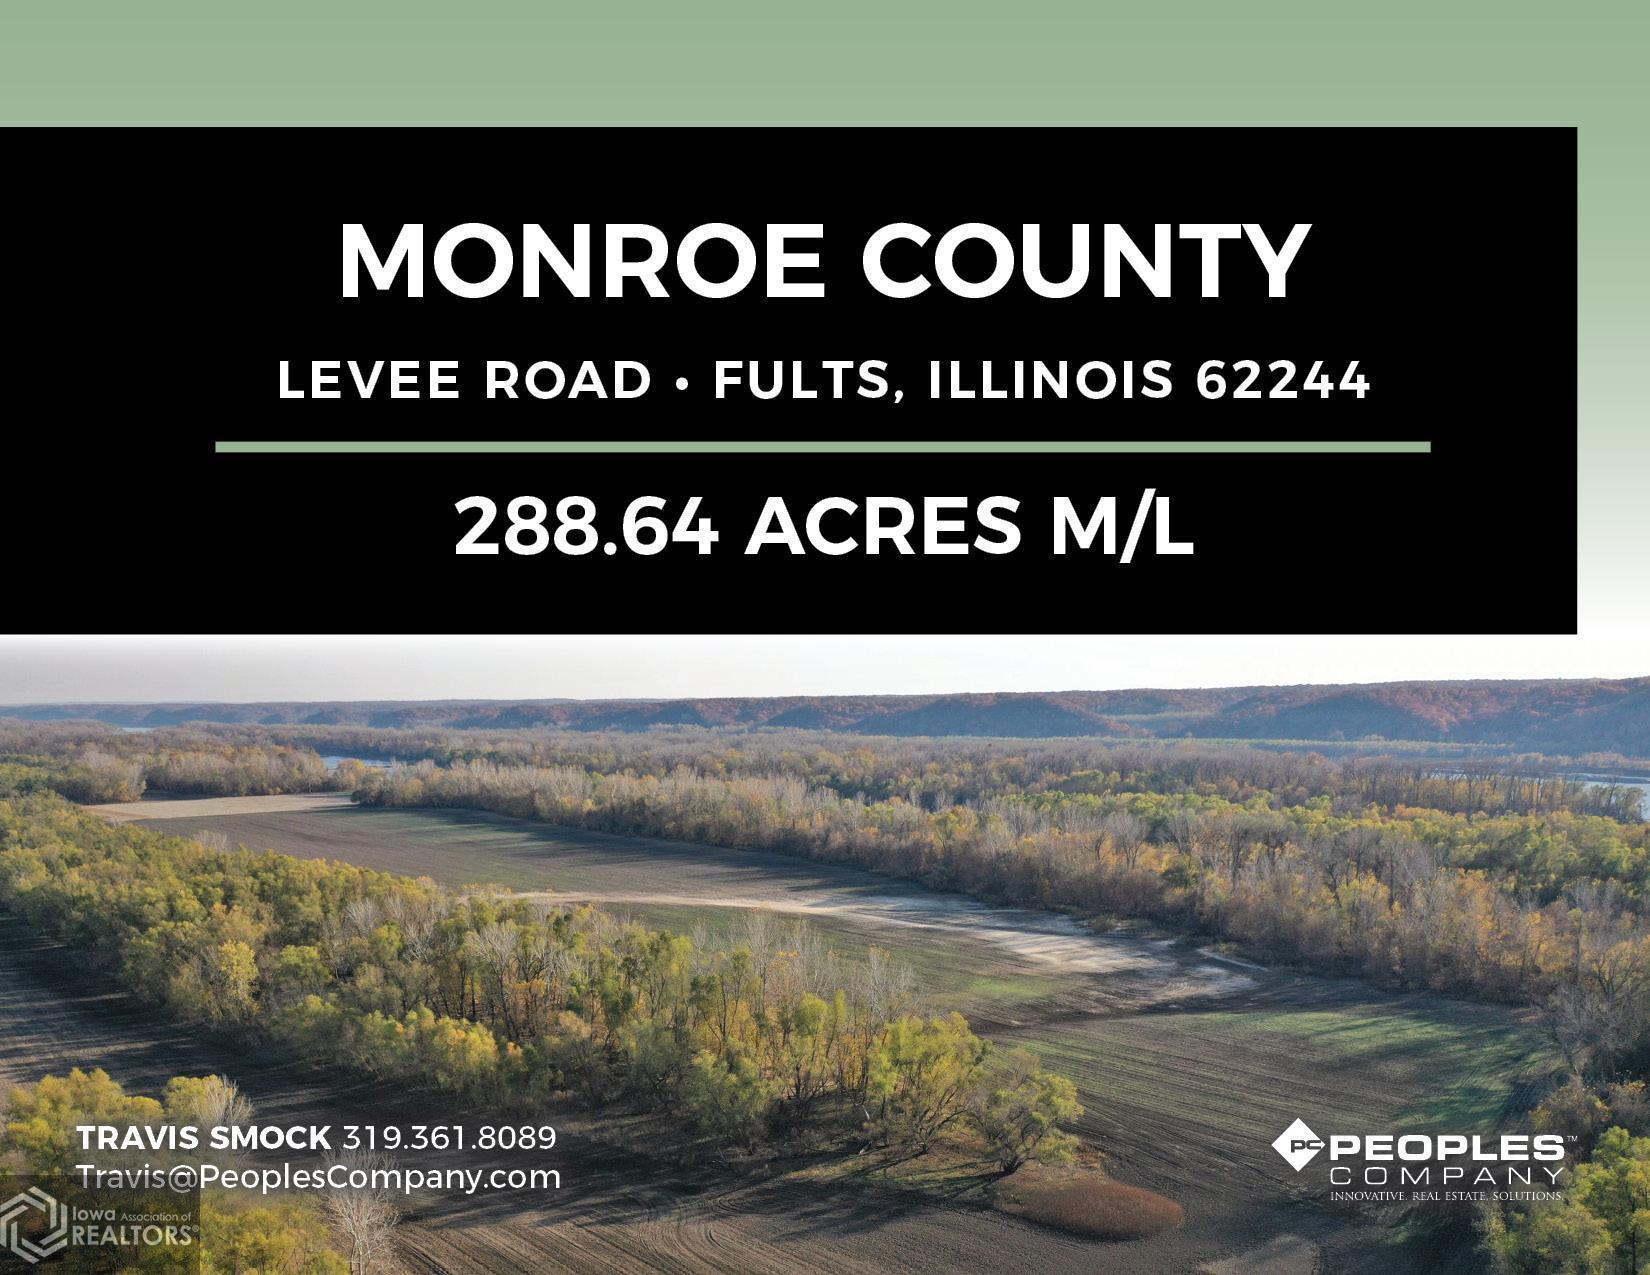 02 Levee Road,